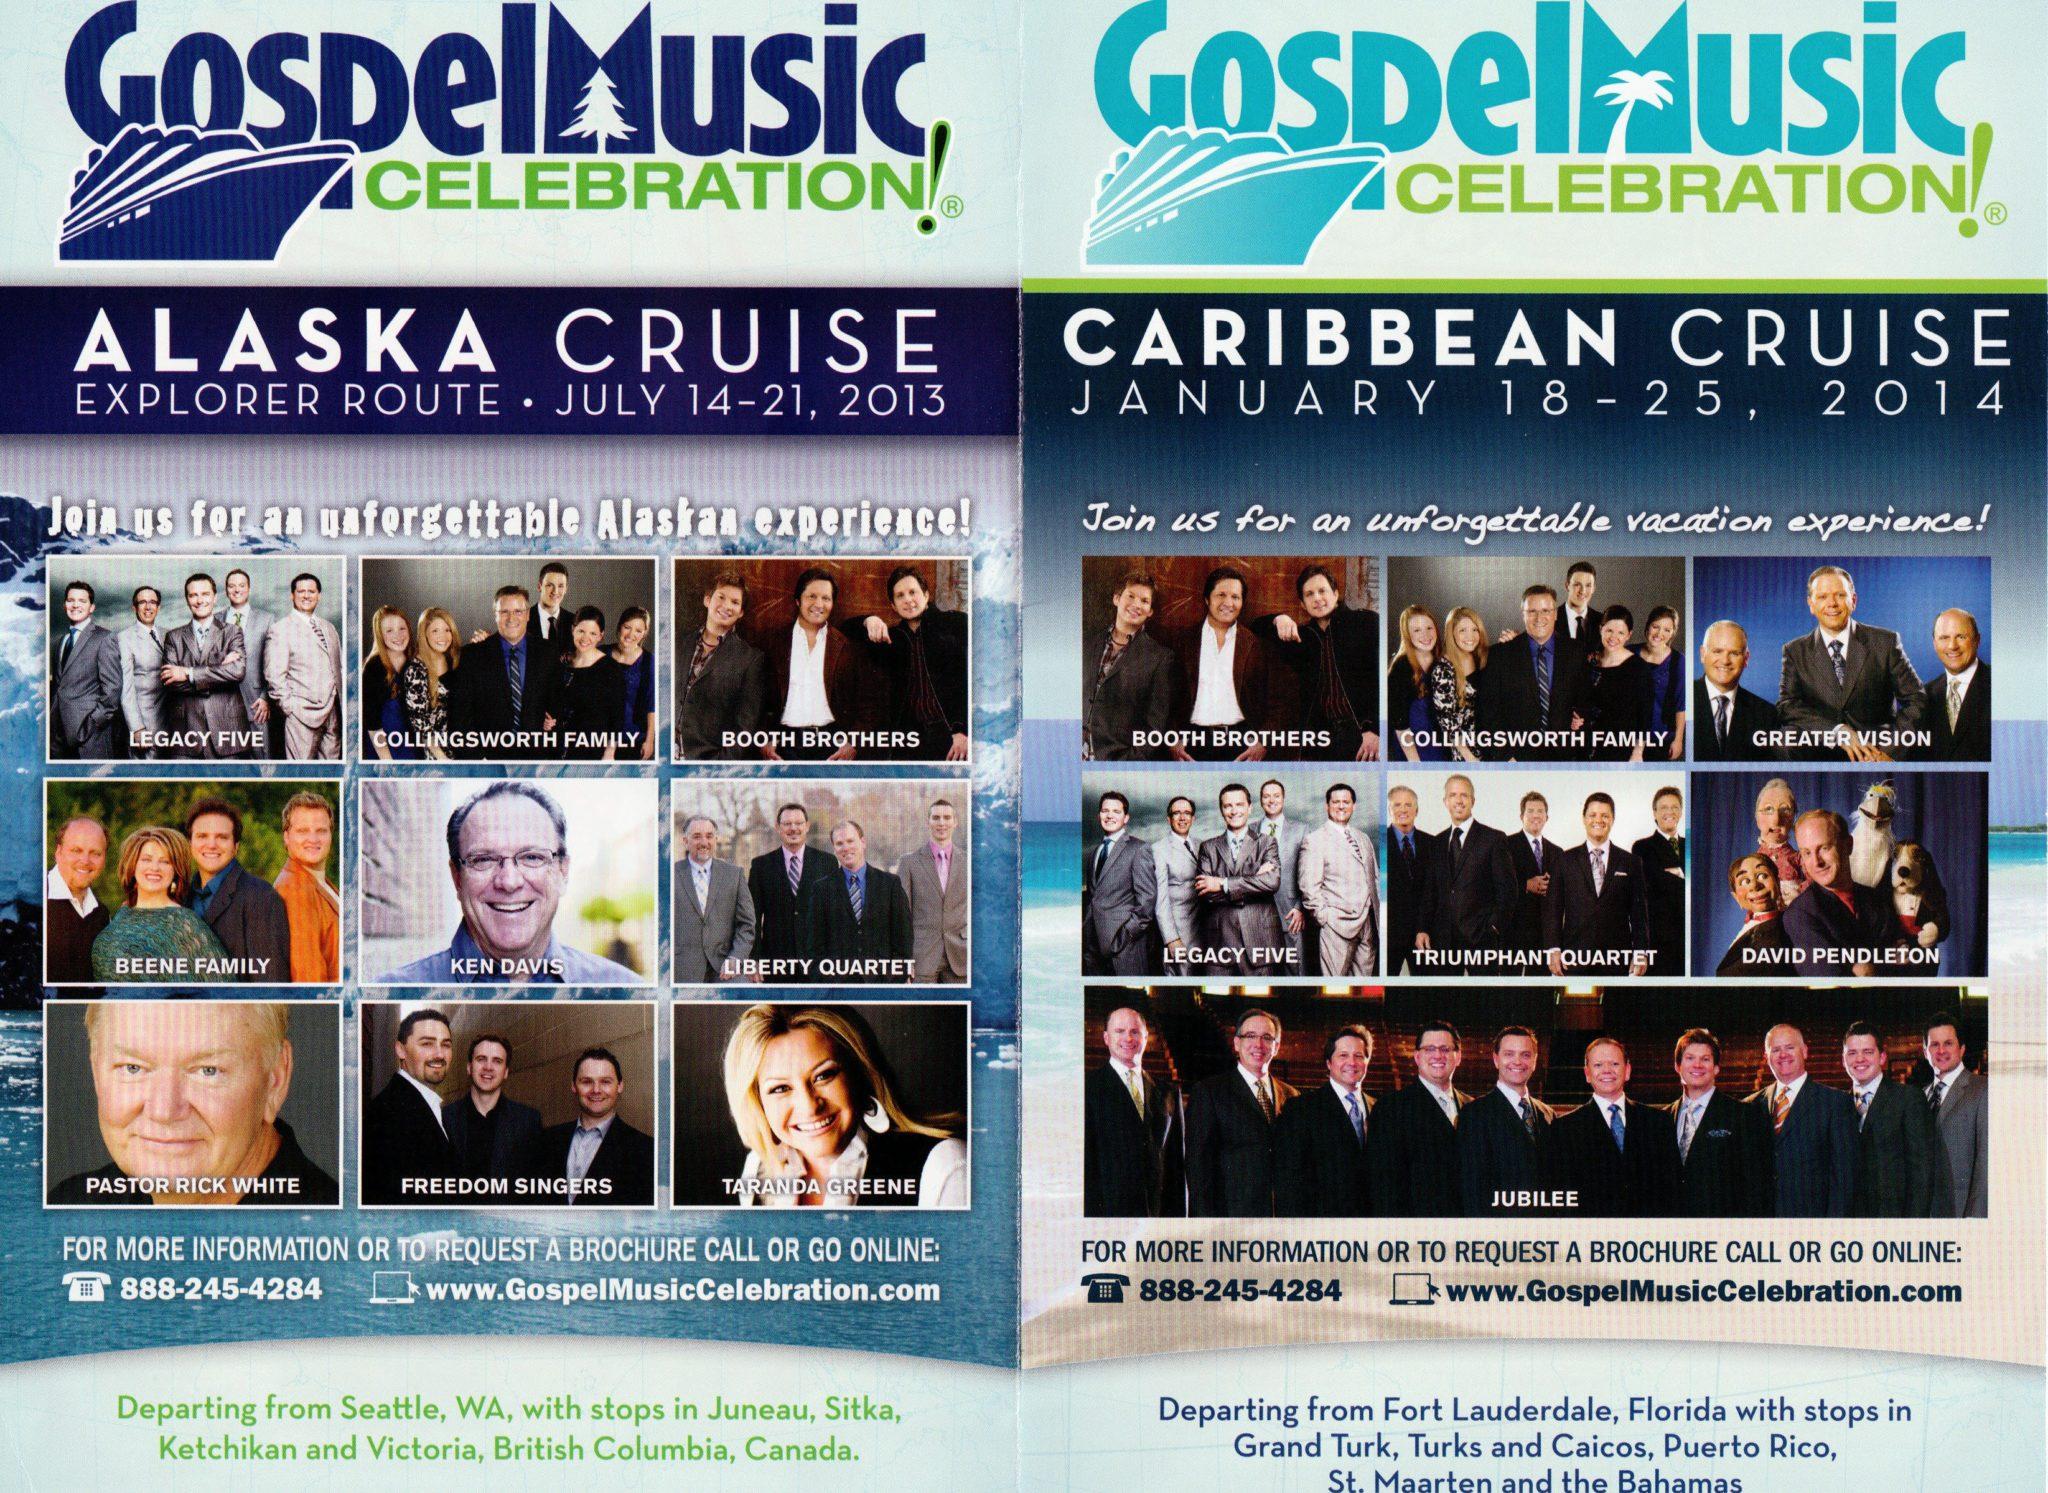 cruisefever.net